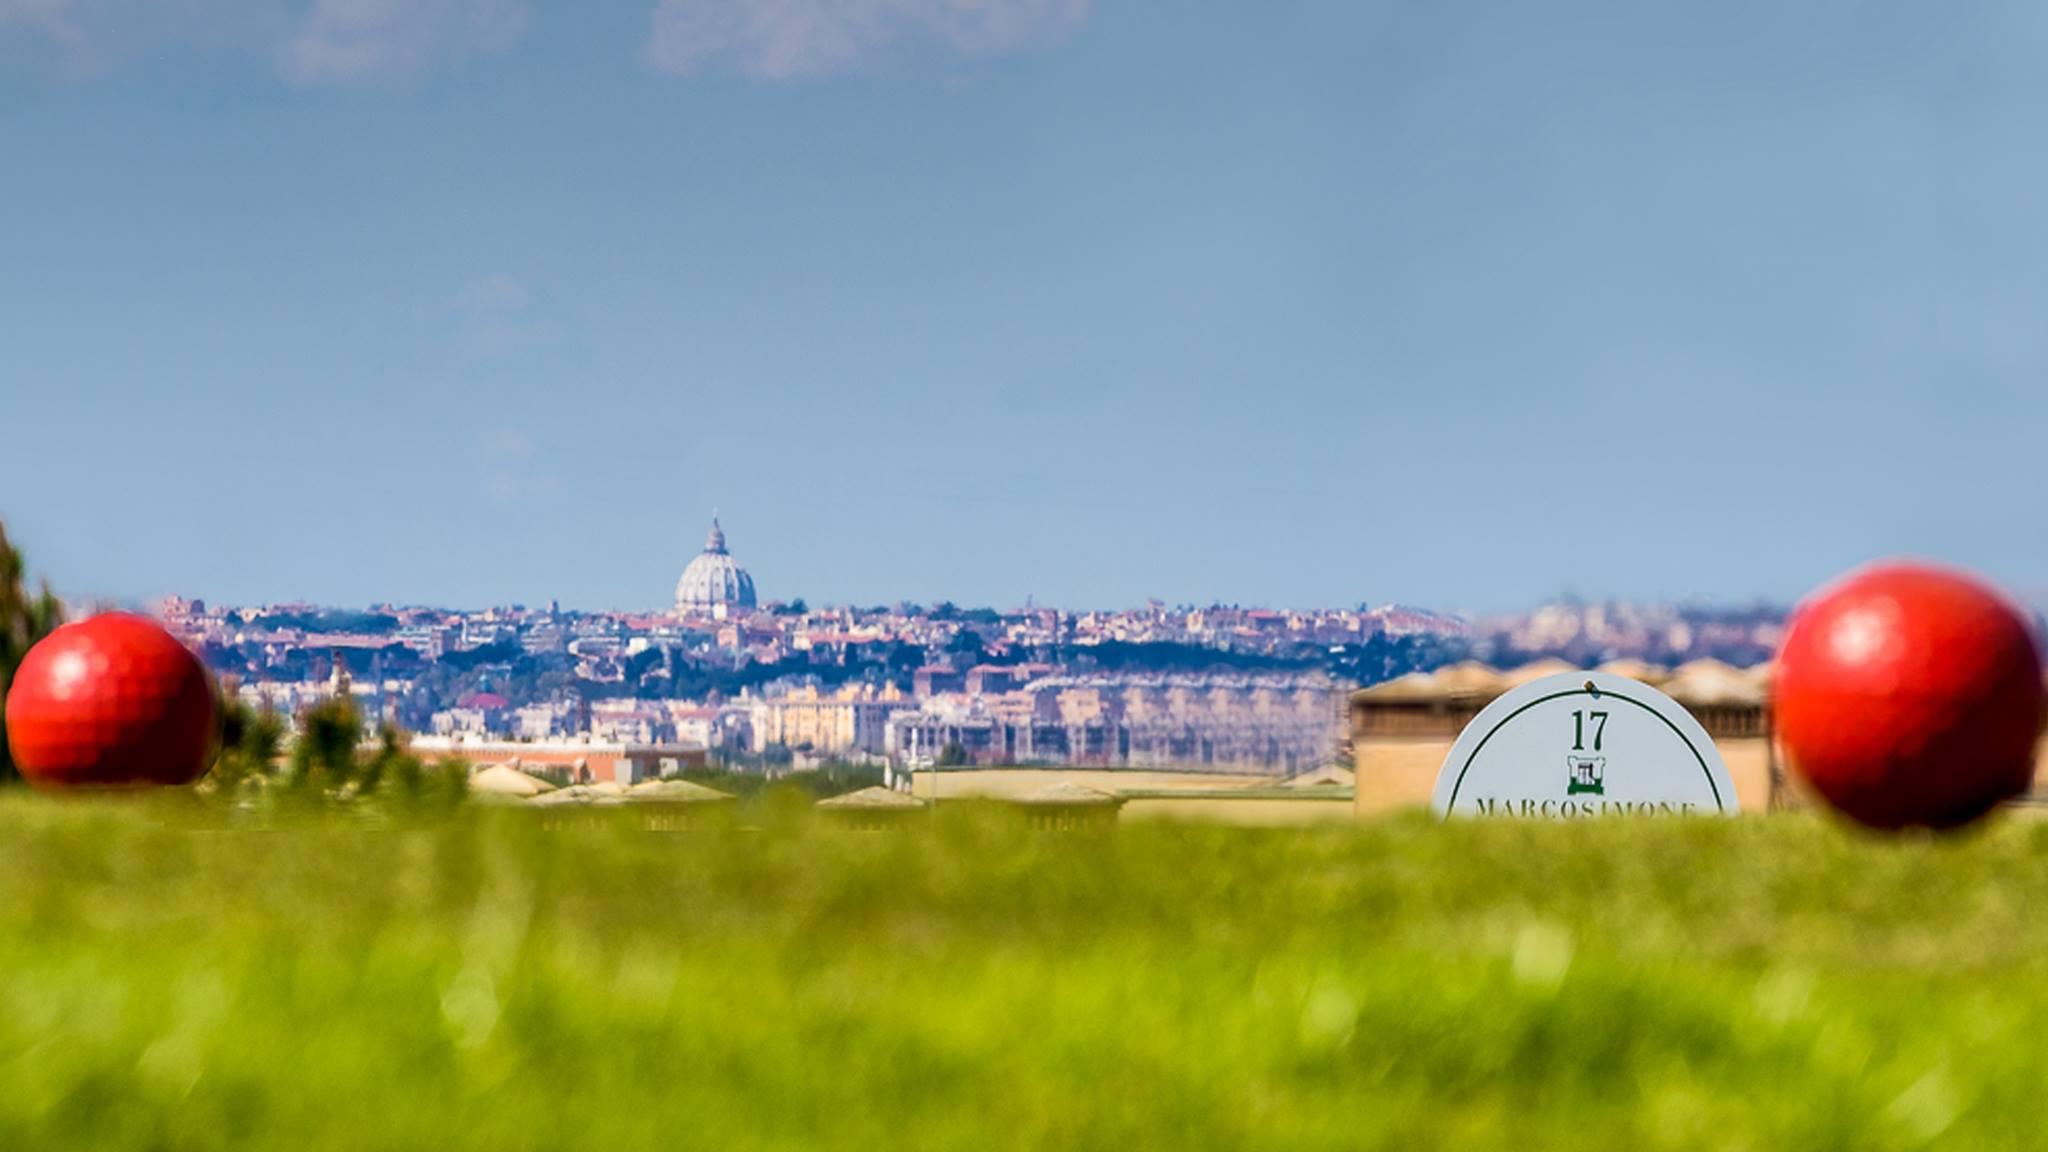 marco-simone-golf-club10